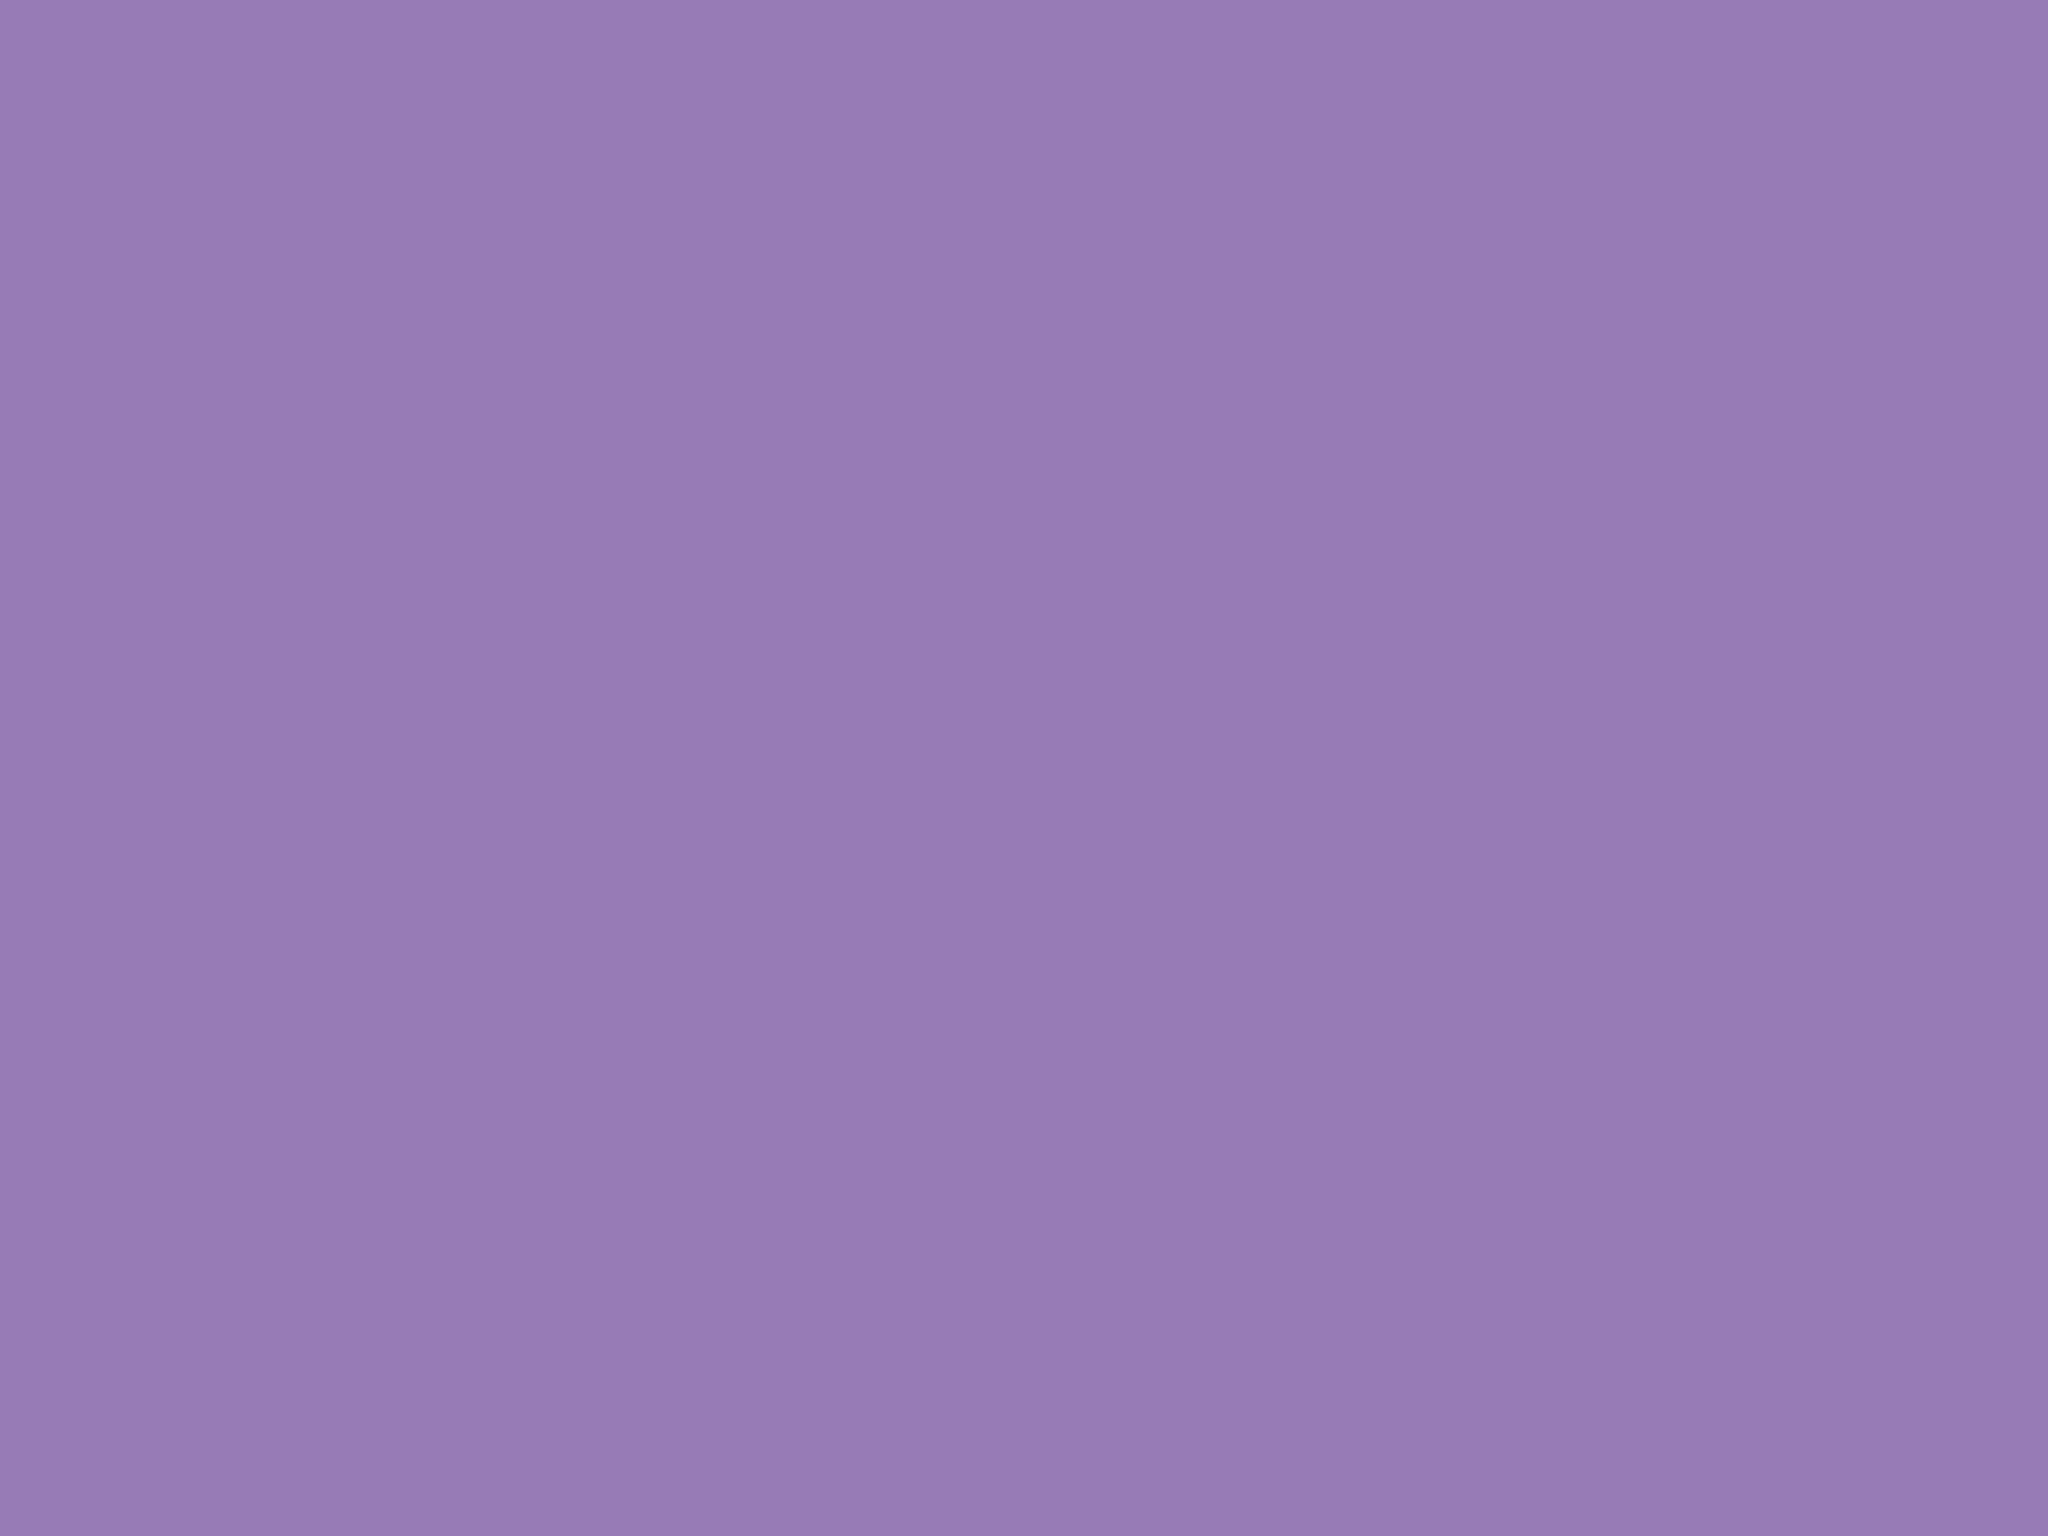 2048x1536 Lavender Purple Solid Color Background